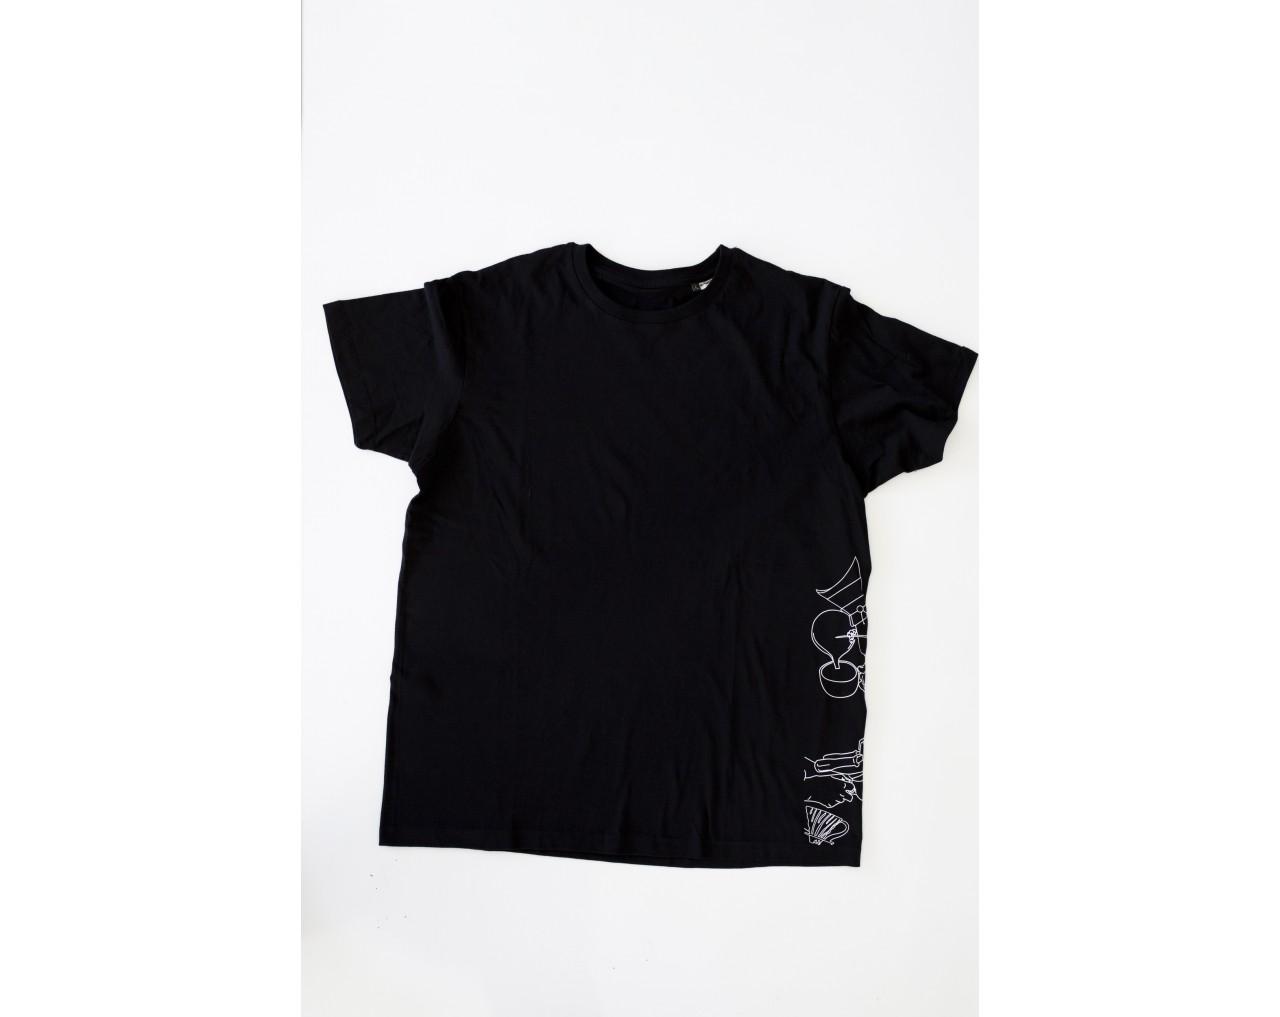 Taf Black T-shirt